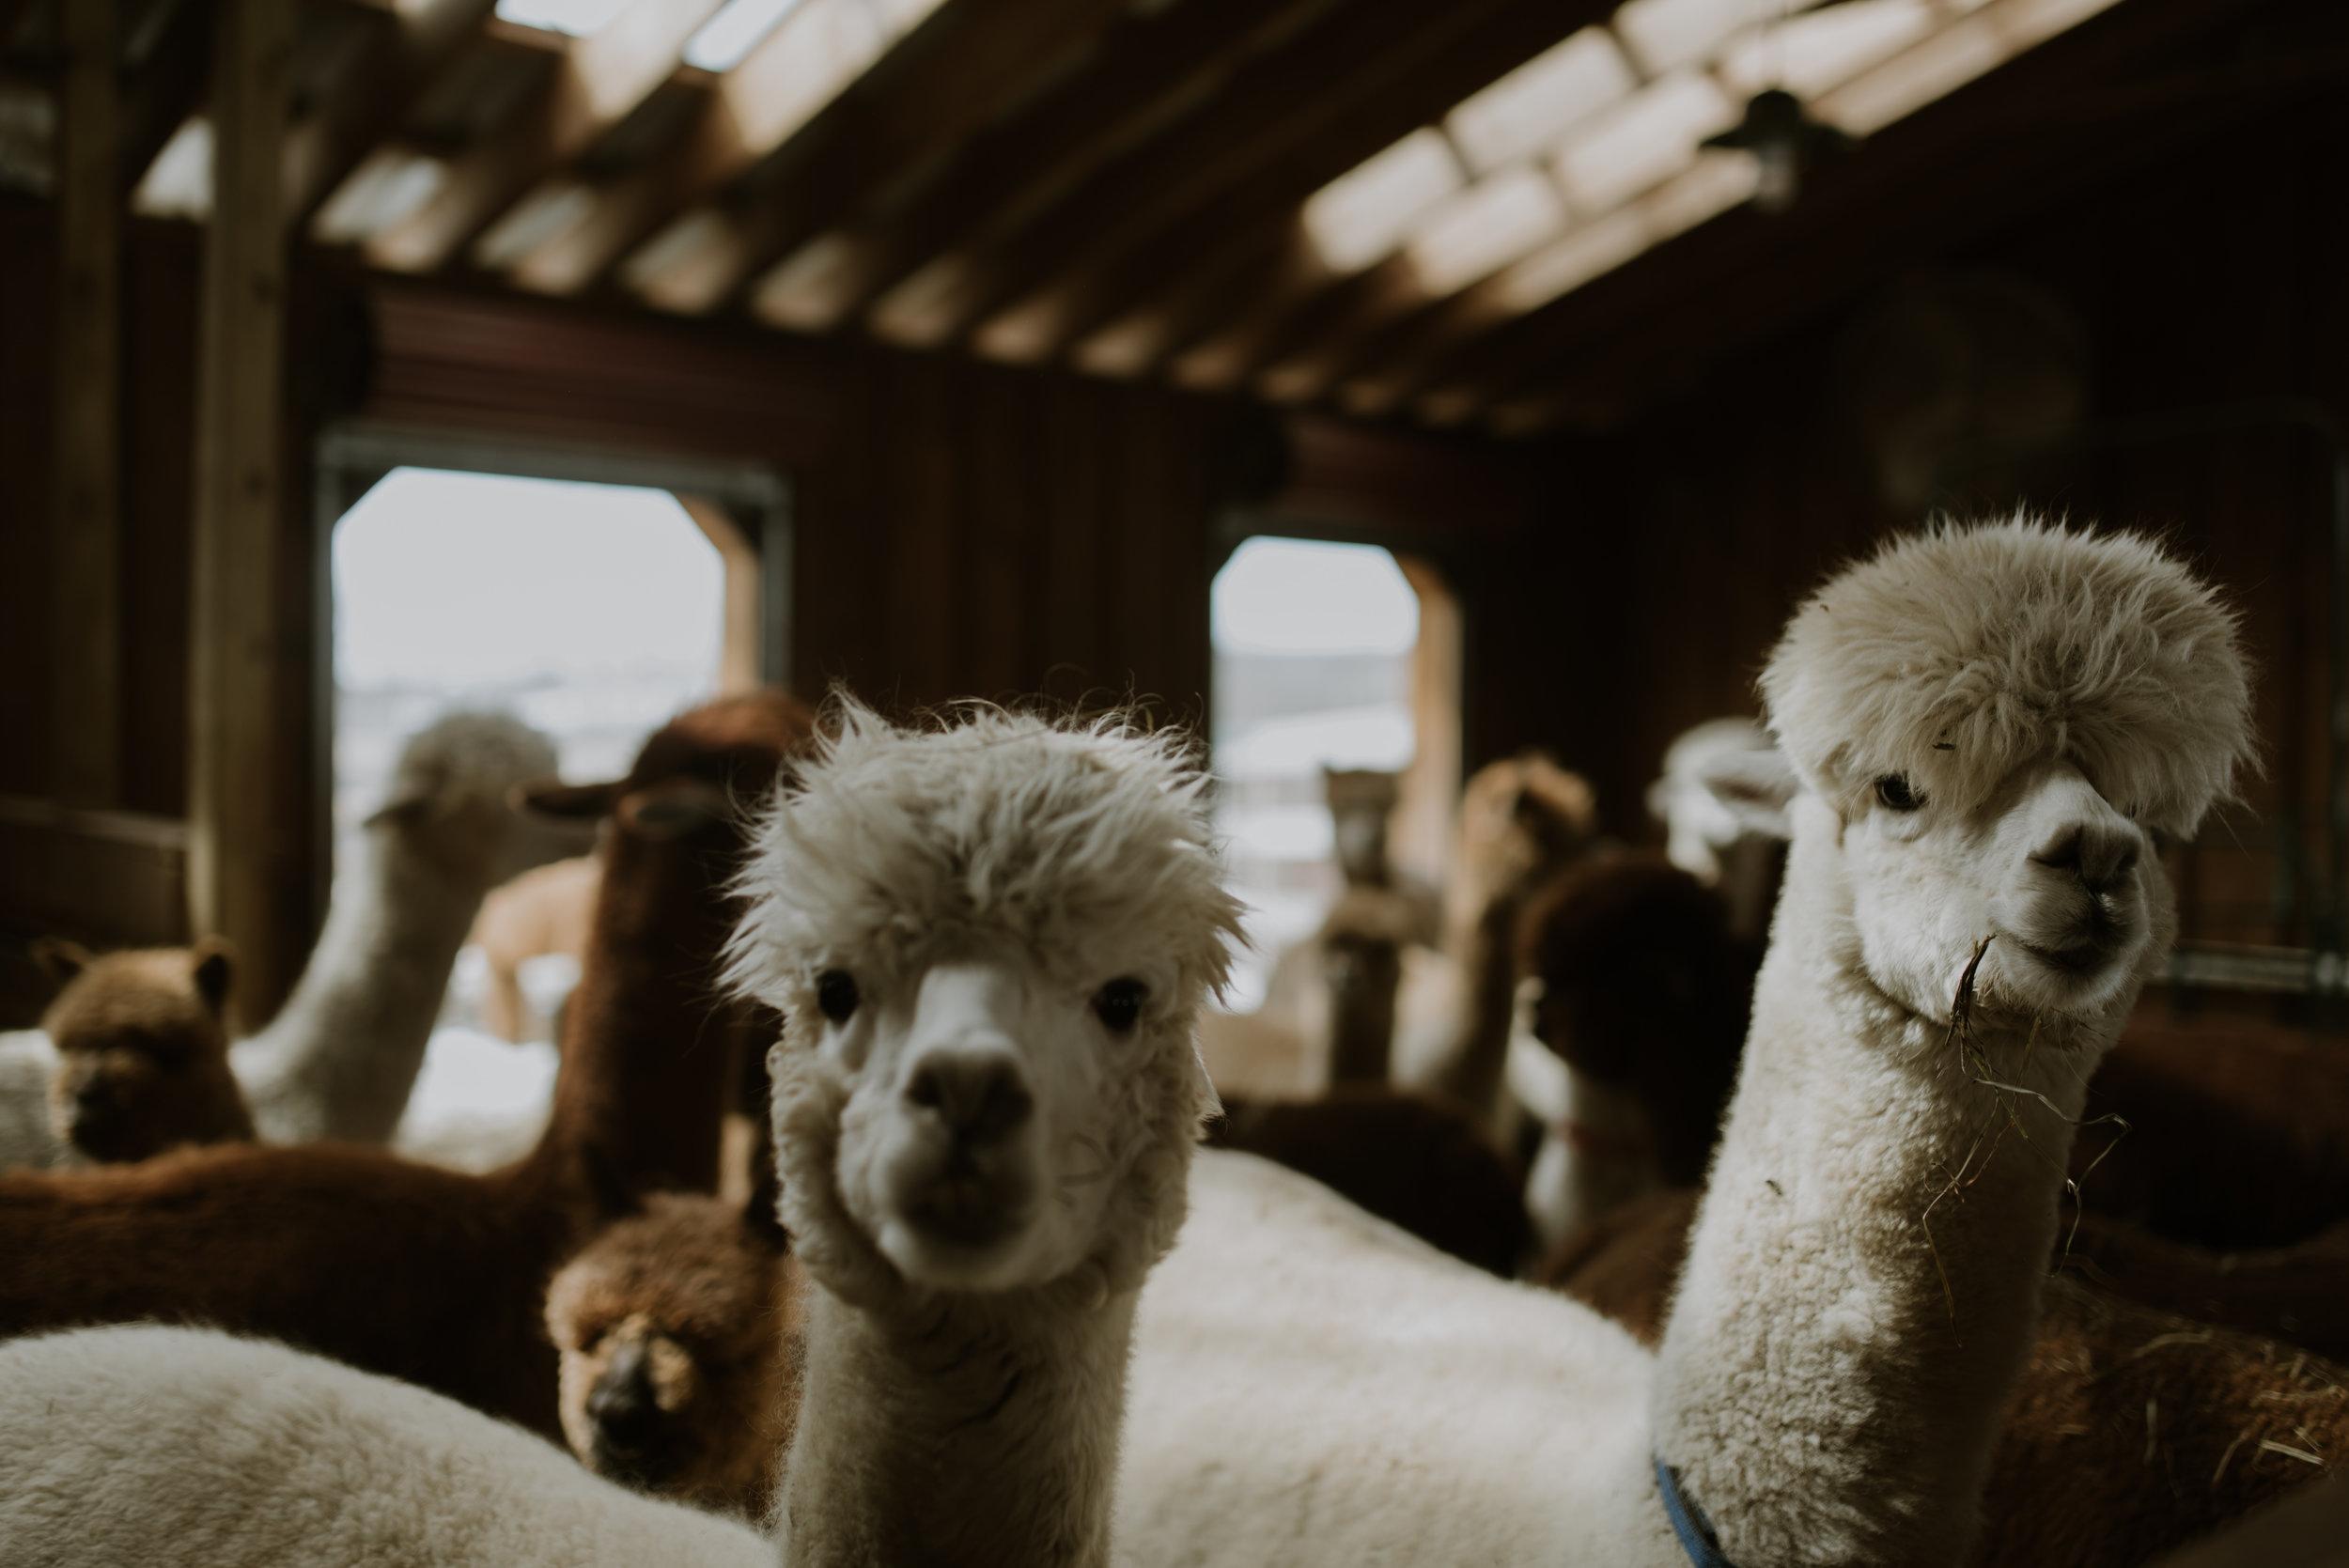 Foster-Supply-Co-Buck-Brook-Alpacas-MarchWinter-Snow-2018-Lawrence-Braun-0005.jpg